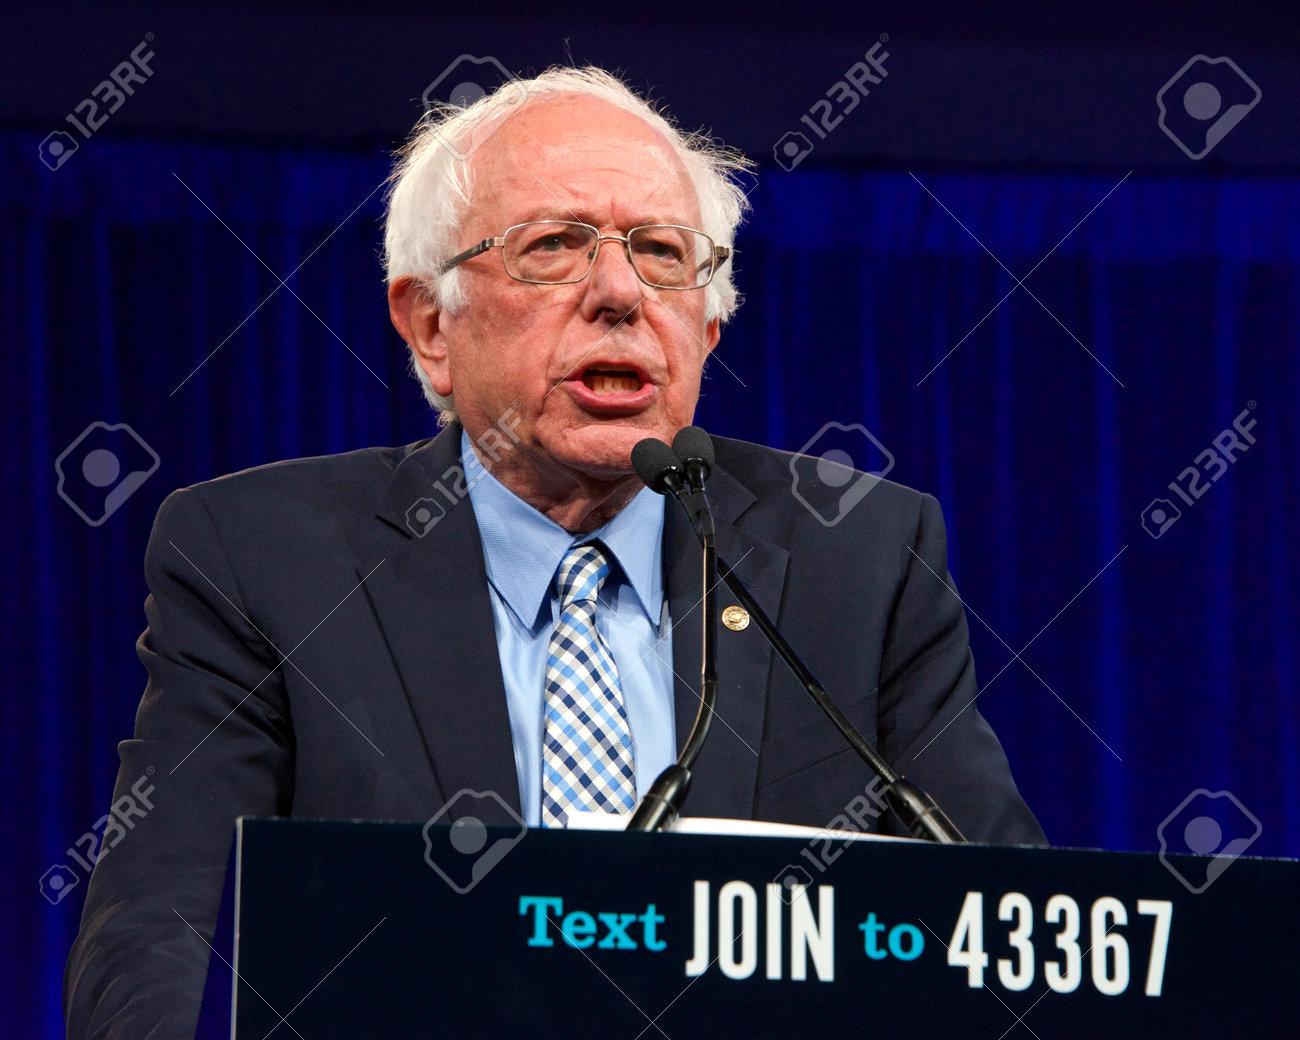 San Francisco, CA - August 23, 2019: Presidential candidate Bernie